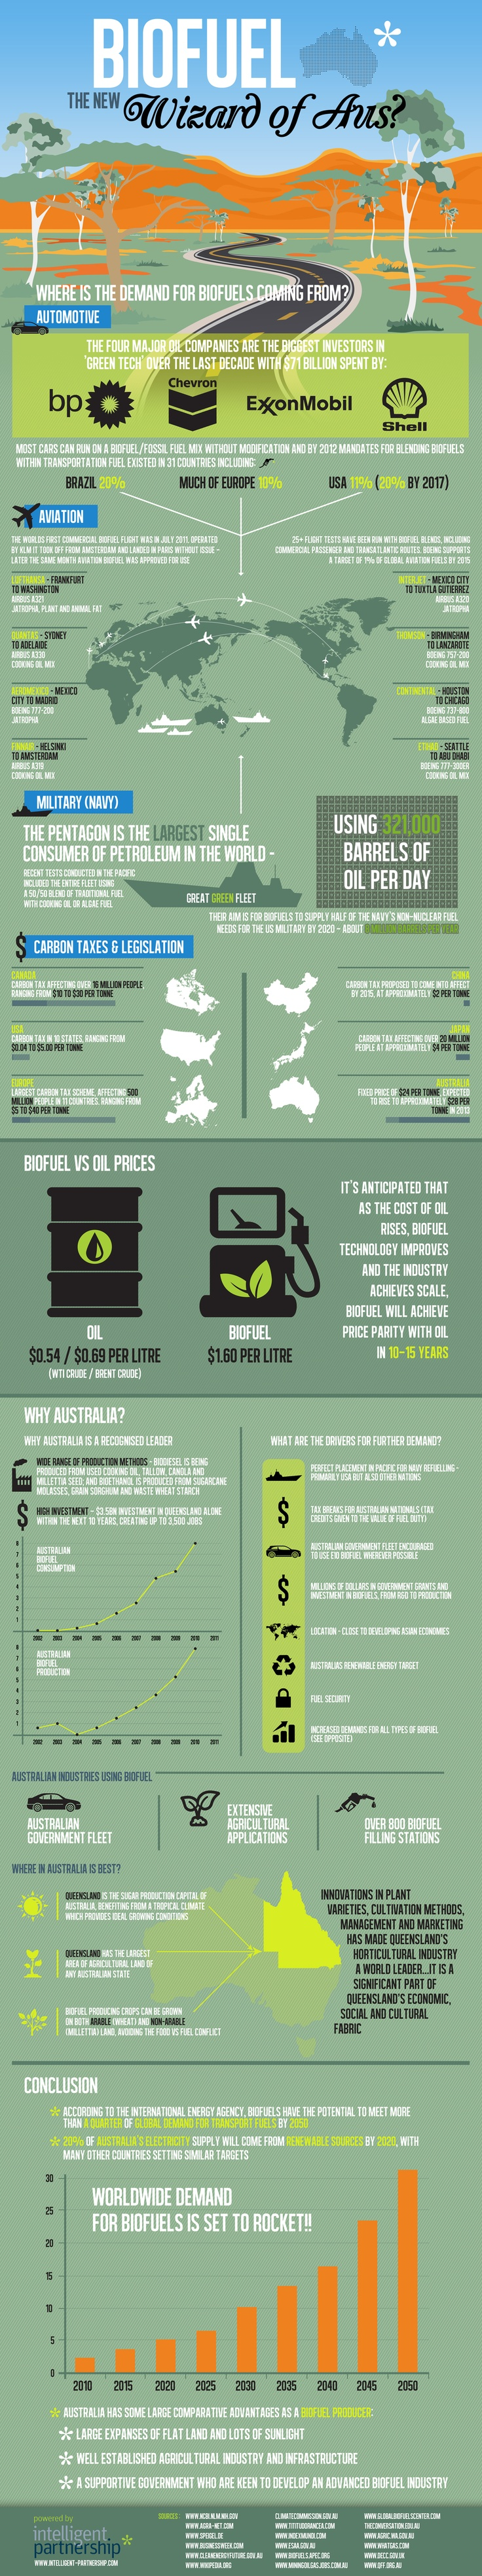 77 best biofuel images on pinterest renewable energy